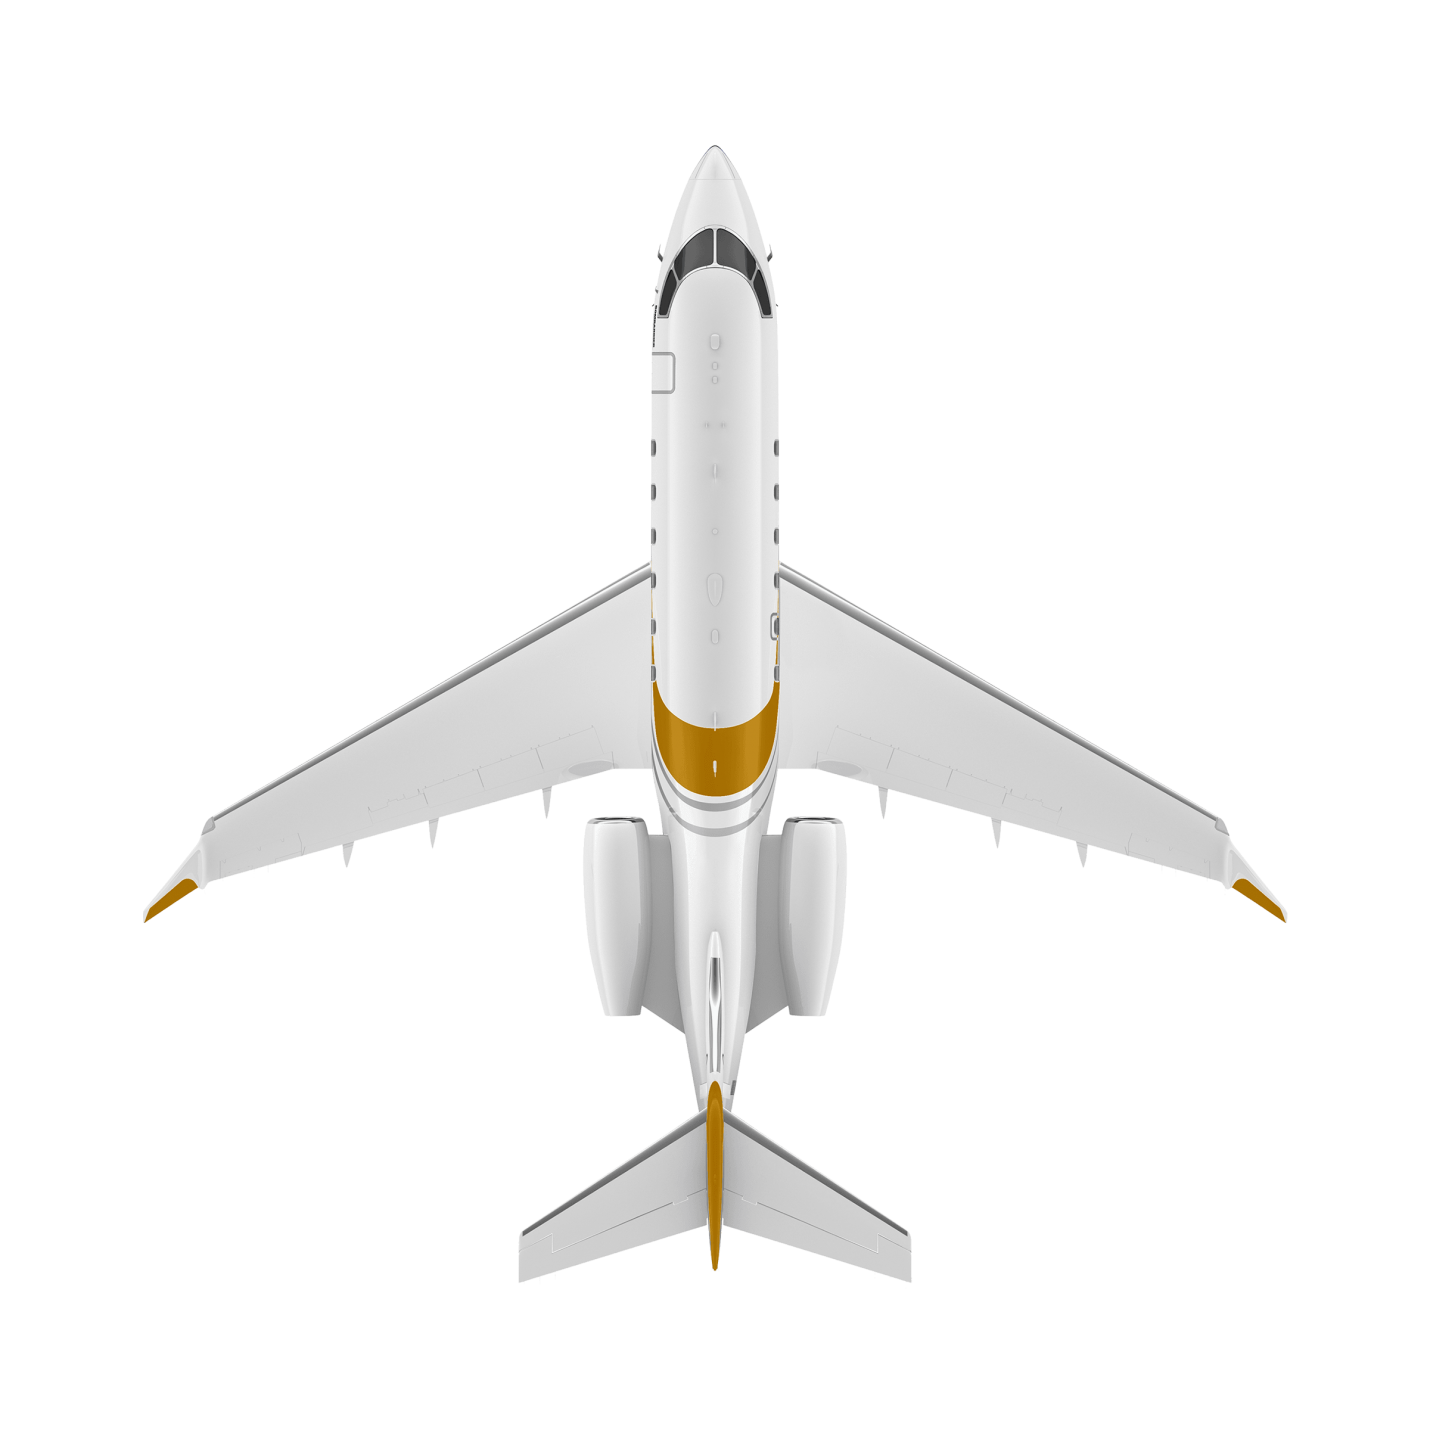 Challenger 3500 top view